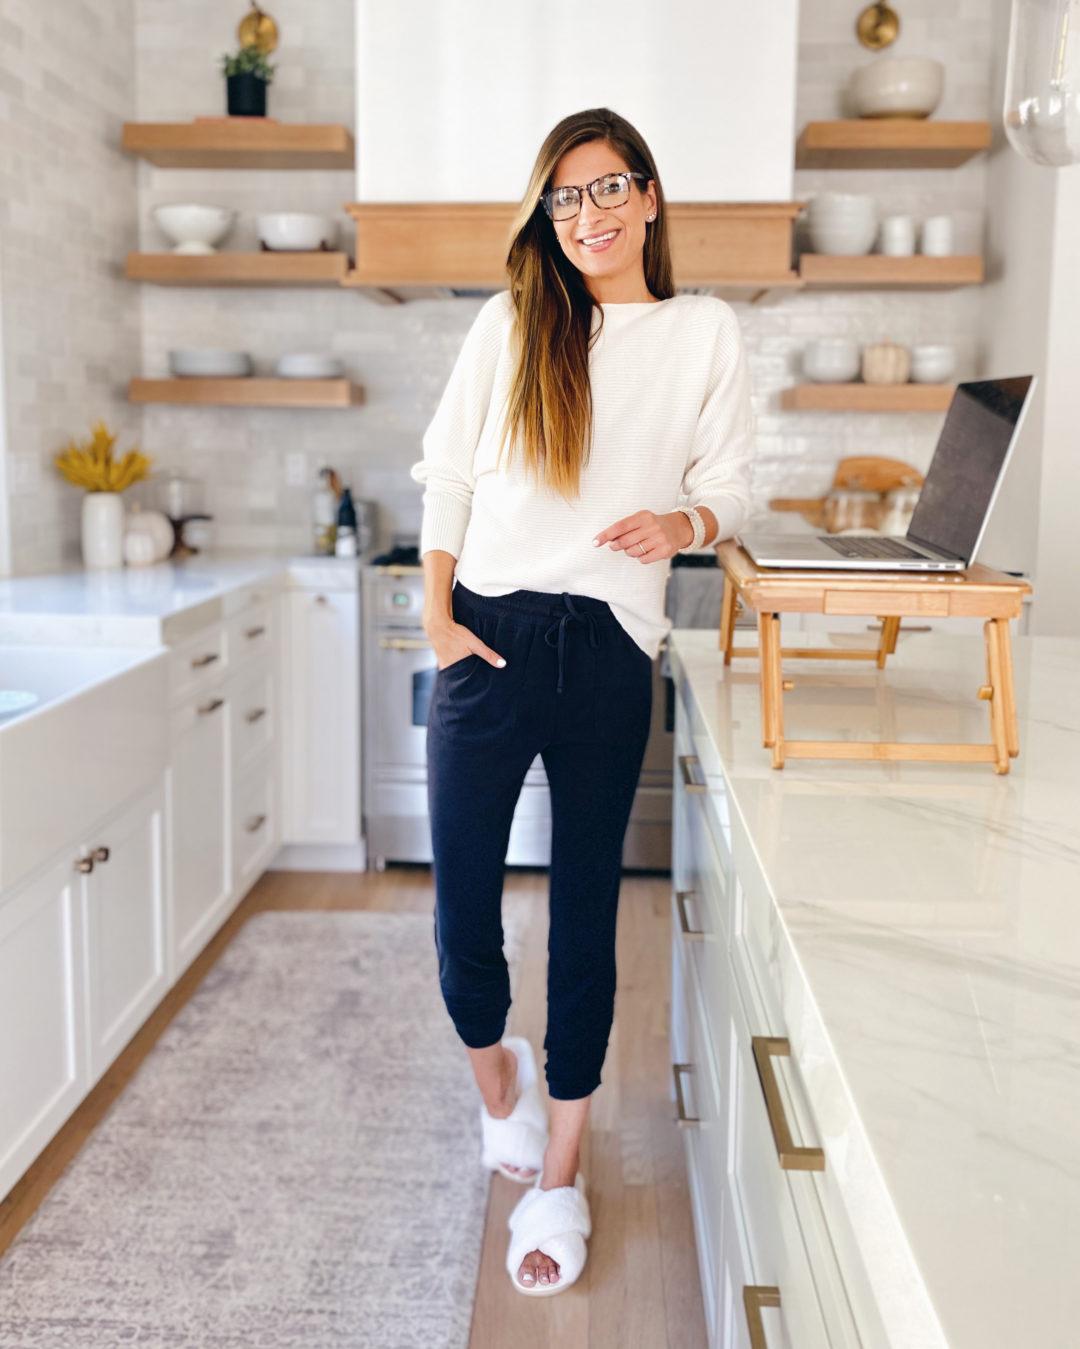 women's workwear hybrid joggers - pinteresting plans blog